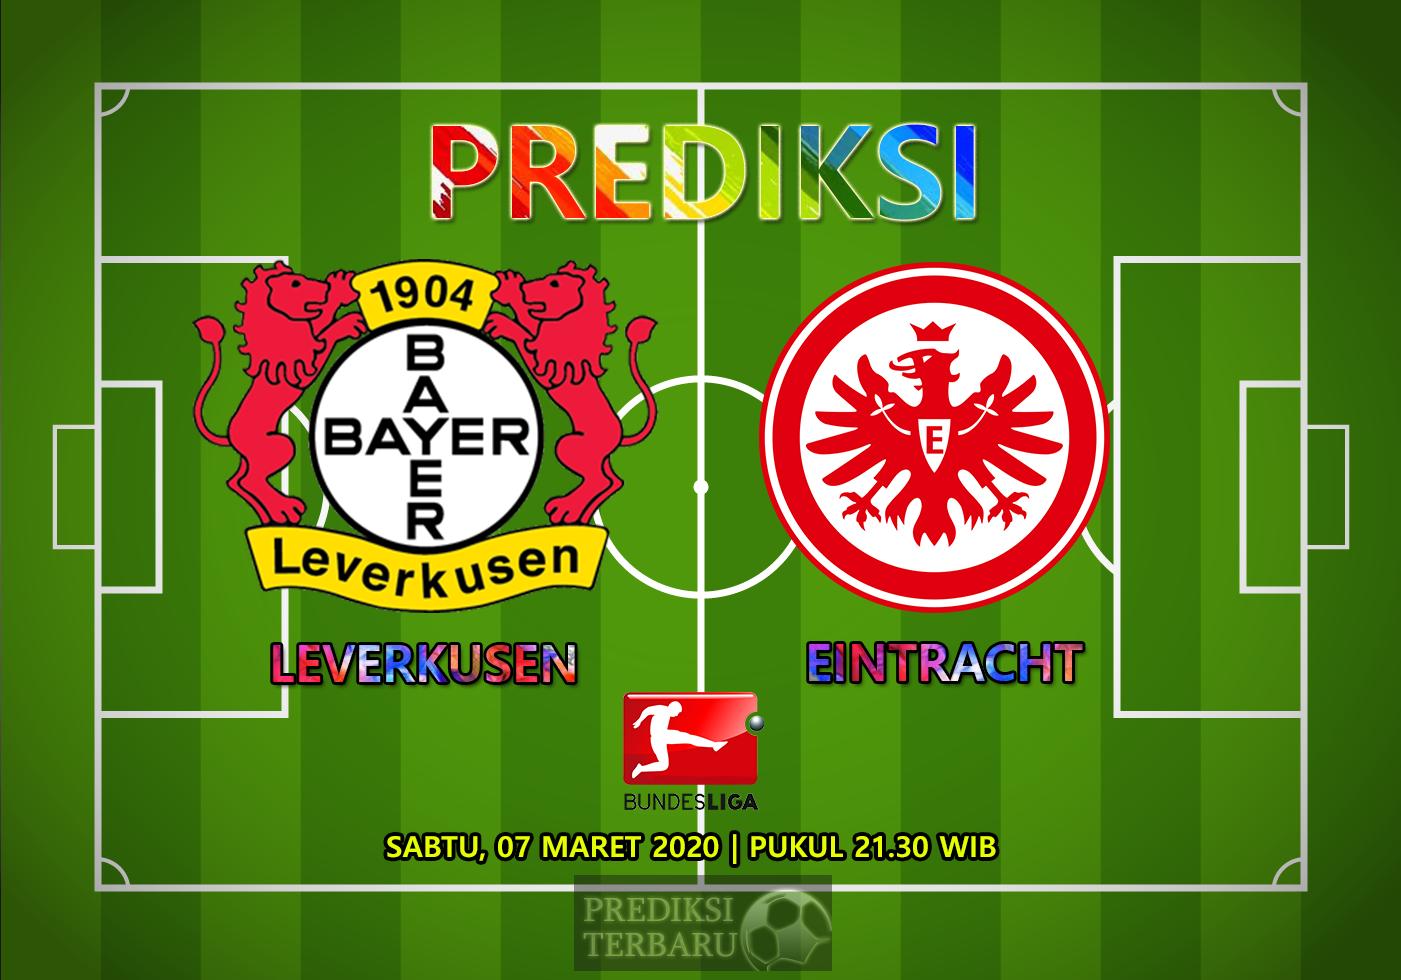 Prediksi Bayer Leverkusen Vs Eintracht Frankfurt Sabtu 07 Maret